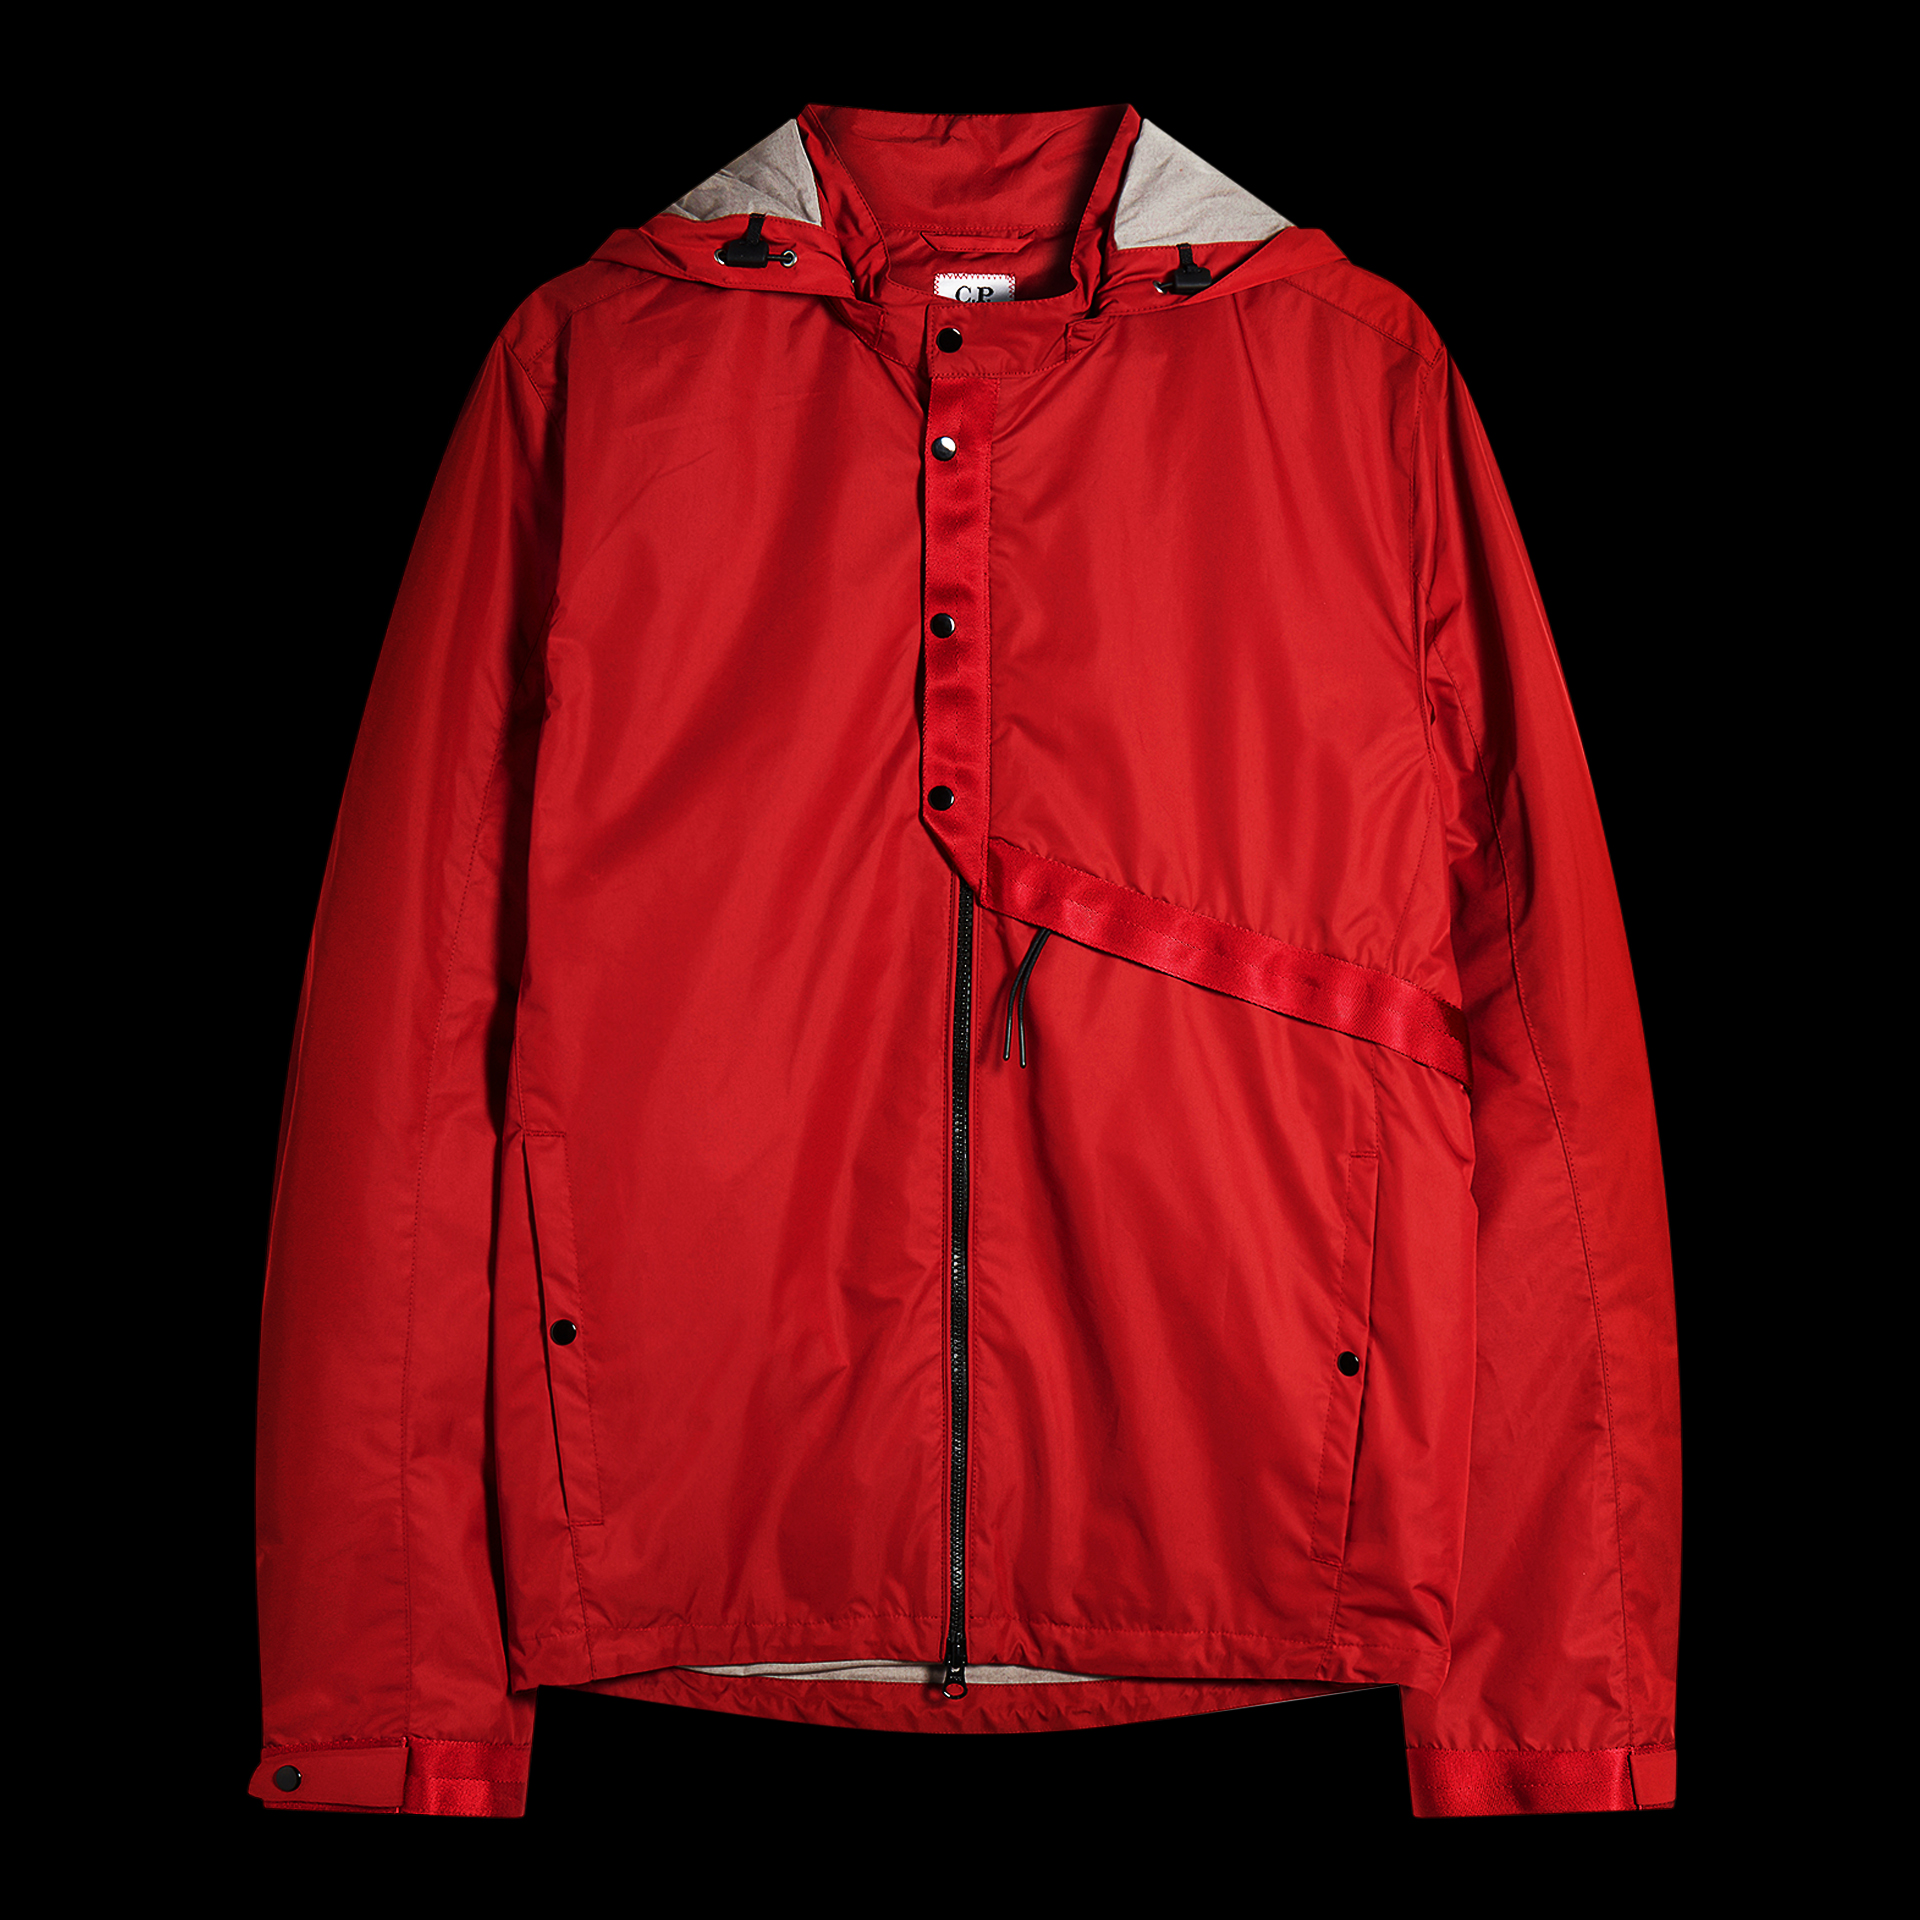 Red C.P. Company rain coat on black background